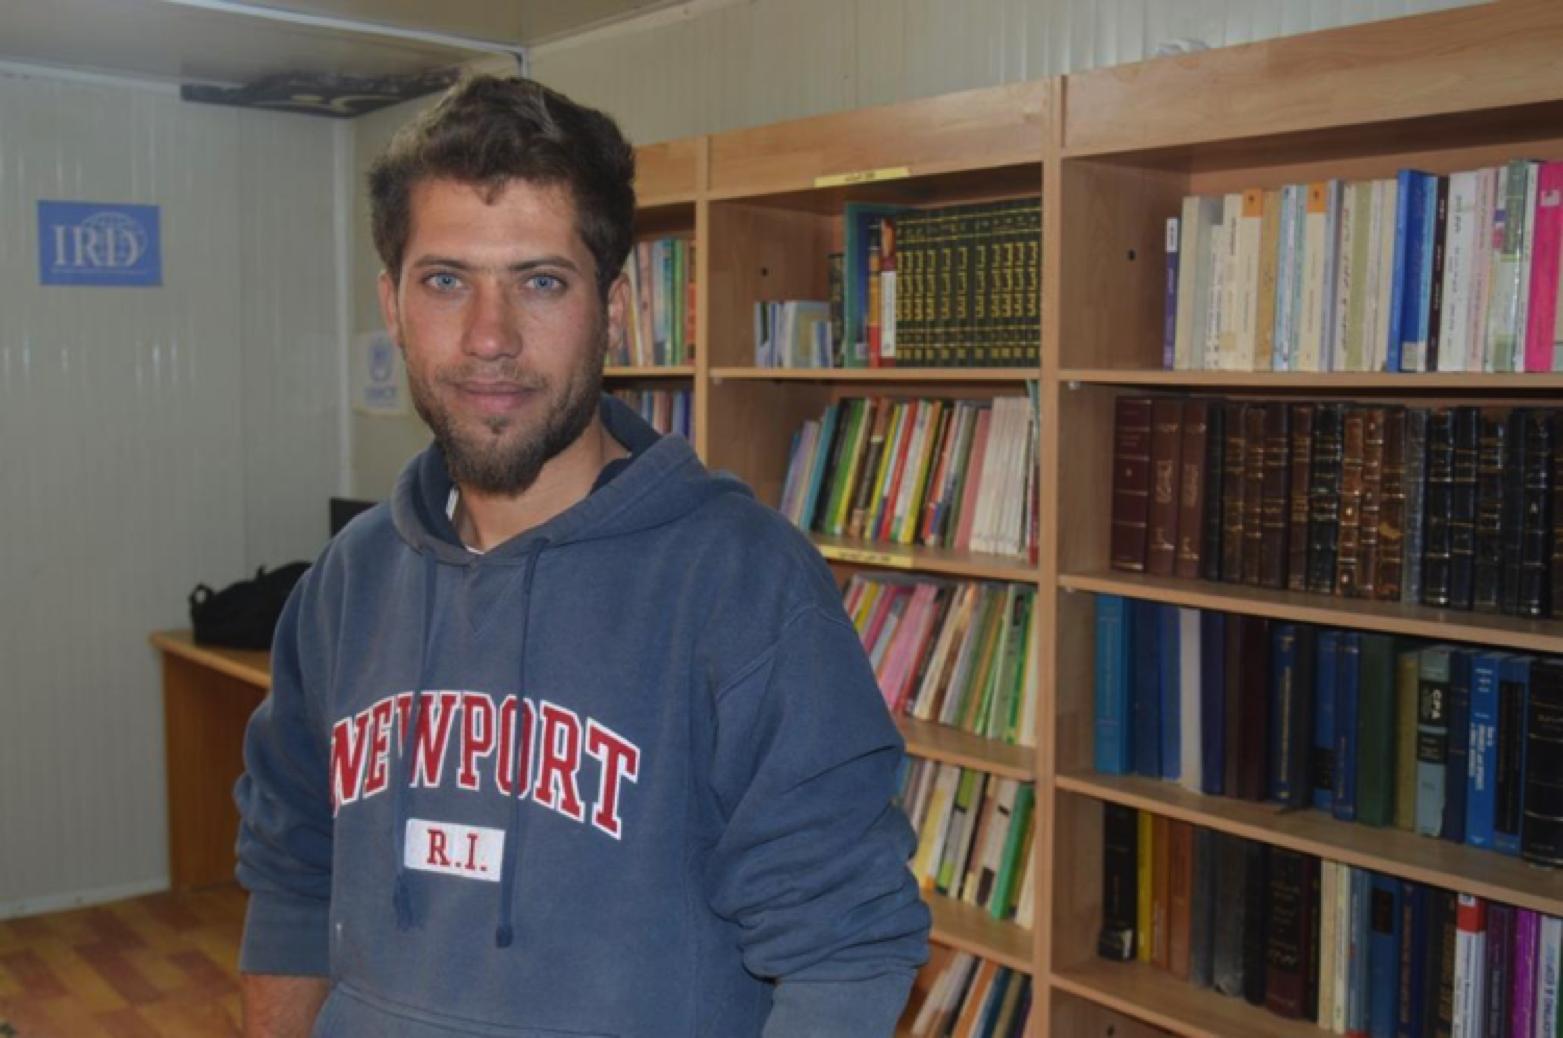 Mohammed Amari - Namr, Derraa, Syria